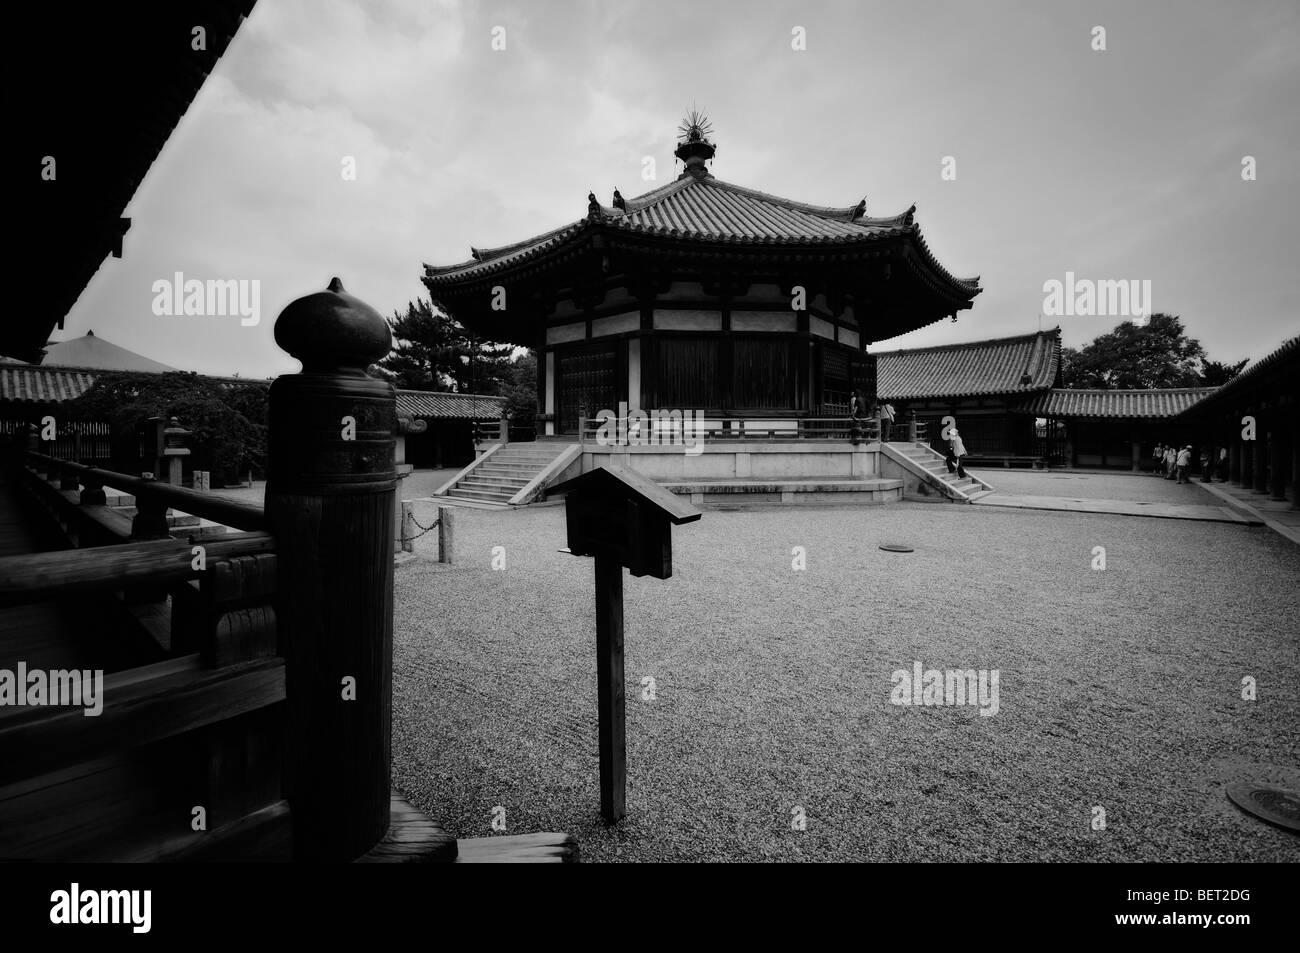 Yumedono (Hall of Dreams). To-in area. Horyu-ji complex. Ikaruga. Nara Prefecture. Kansai (aka Kinki) region. Japan Stock Photo